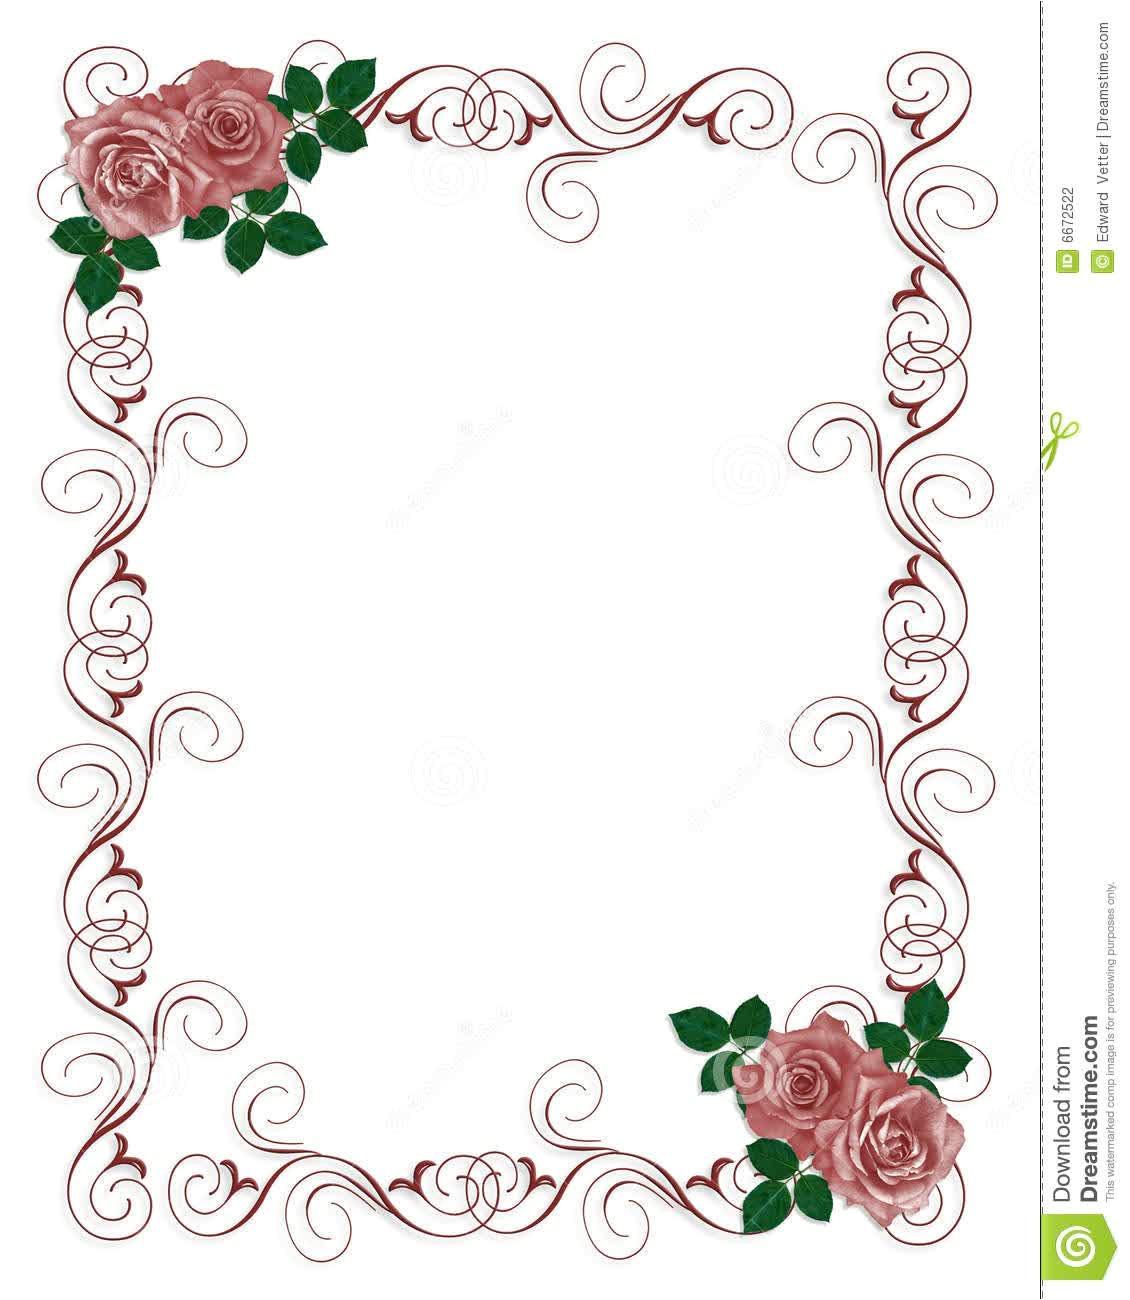 Free Blank Template for Wedding Invitation Floral Blank Wedding Invitation Templates Wedding and Bridal